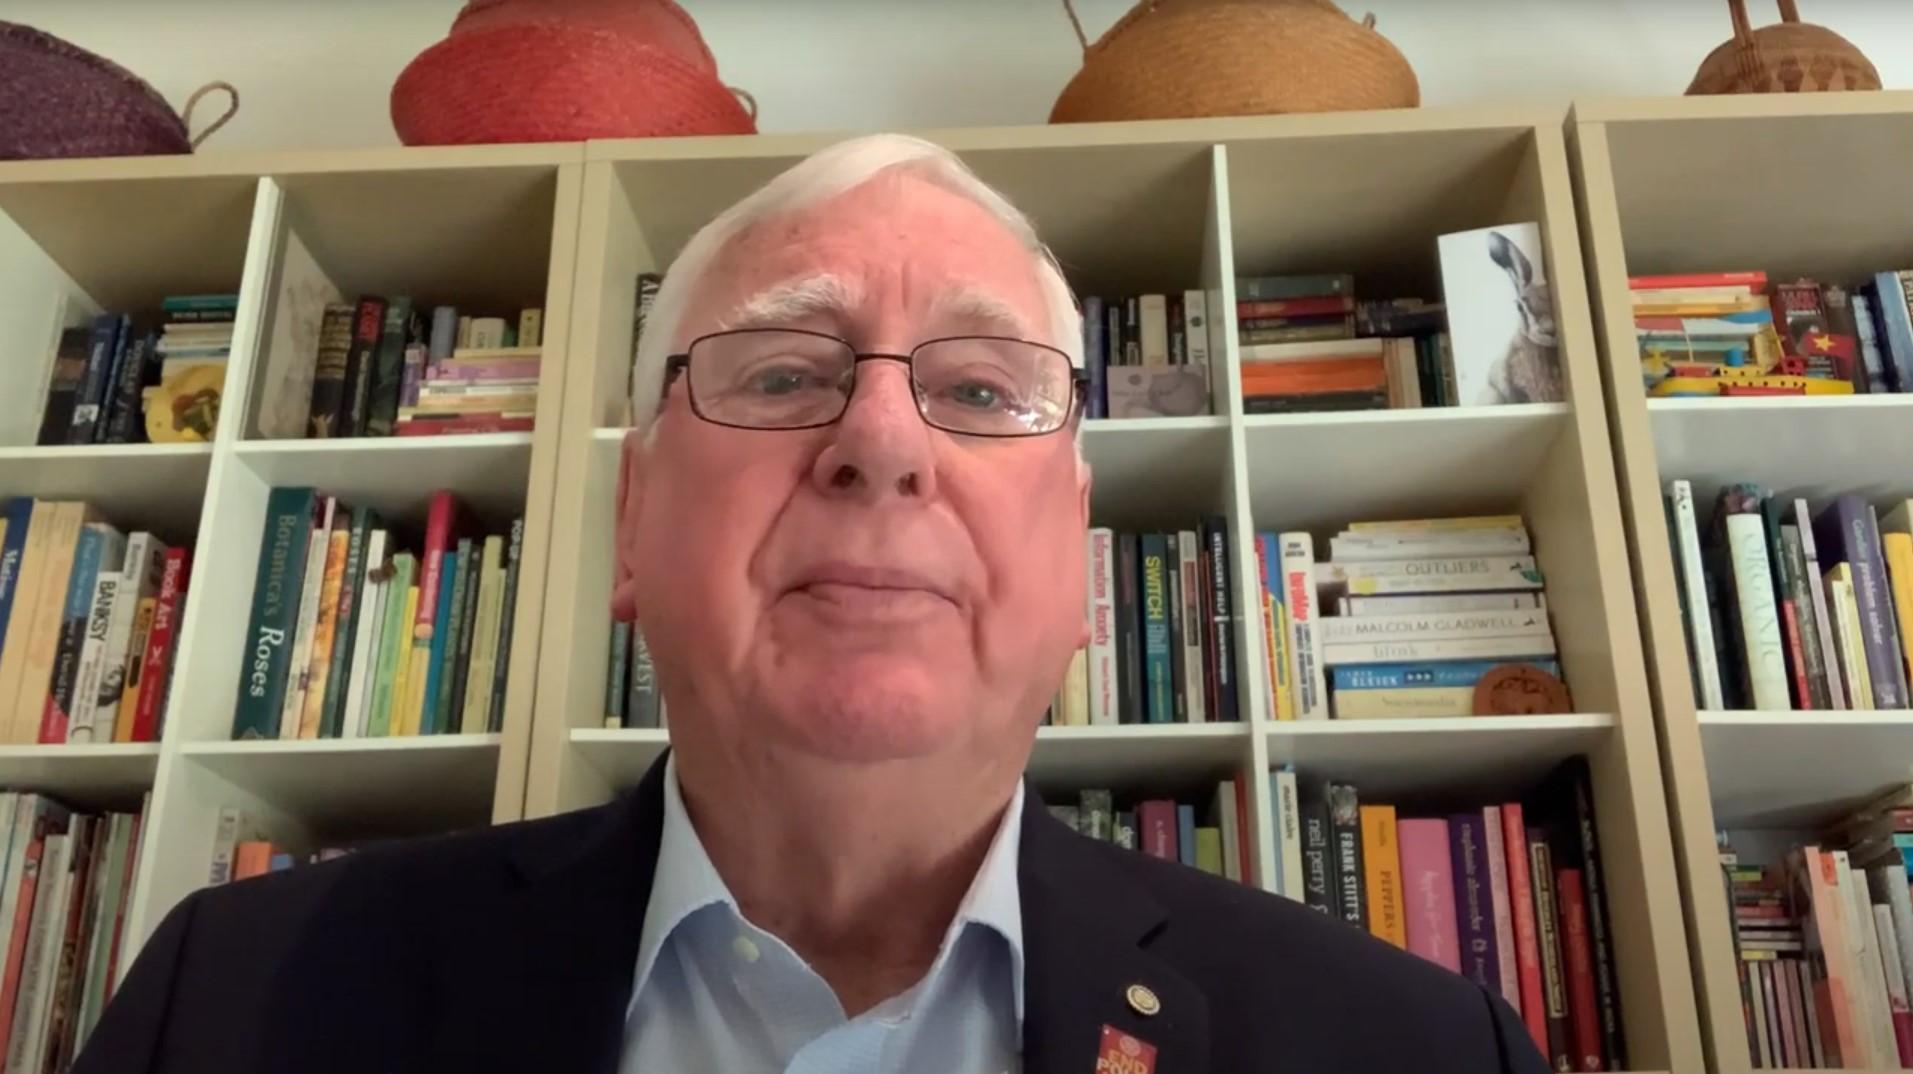 Past Rotary International President Ian Riseley honours a Rotary hero